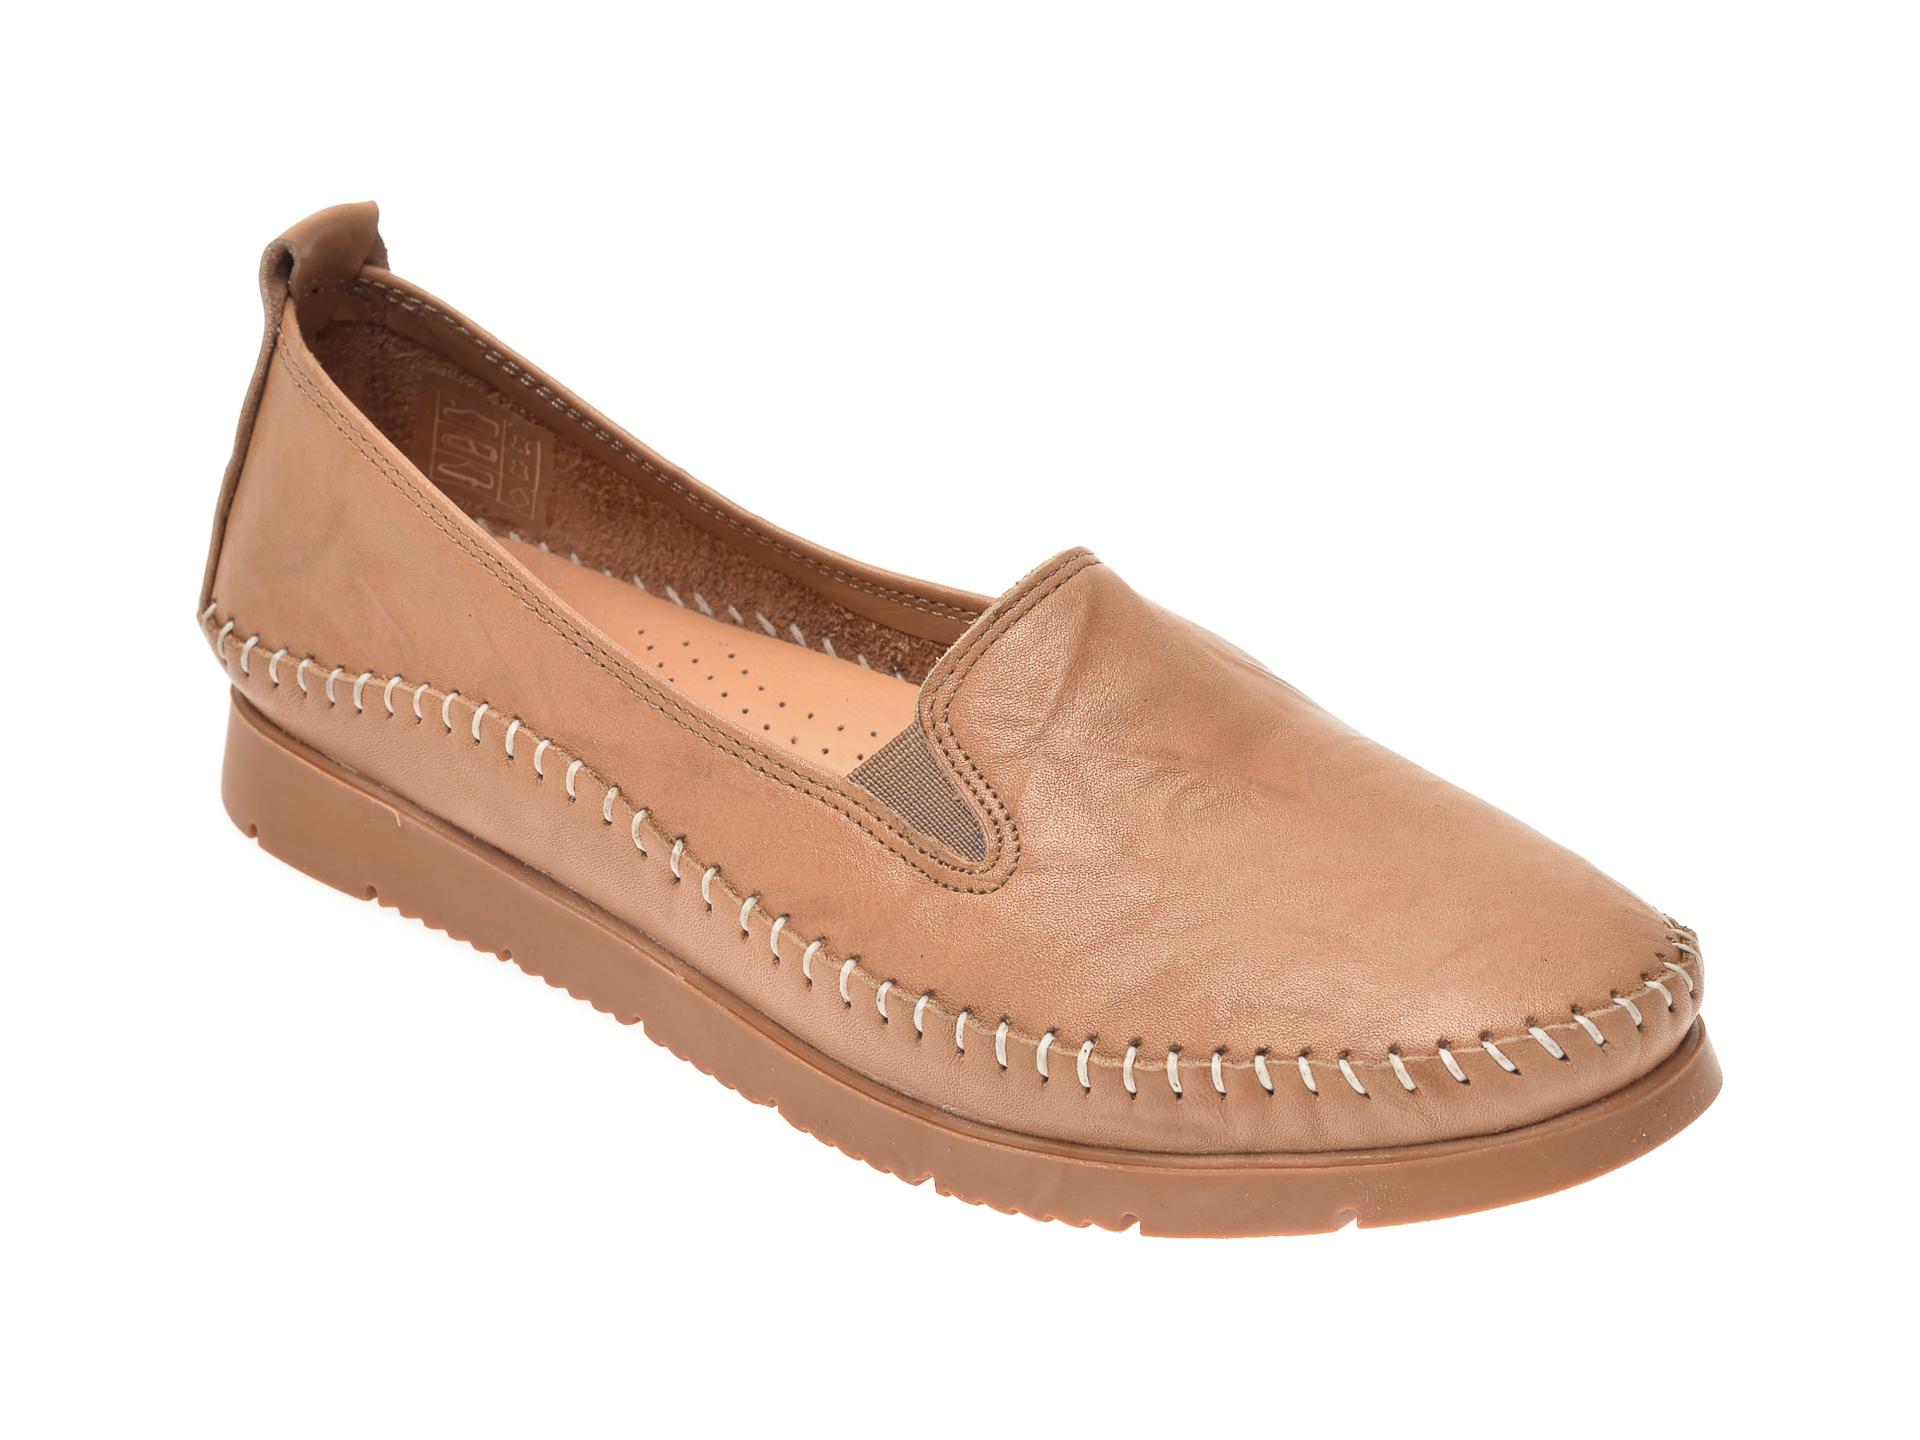 Pantofi FLAVIA PASSINI bej, 1433, din piele naturala New